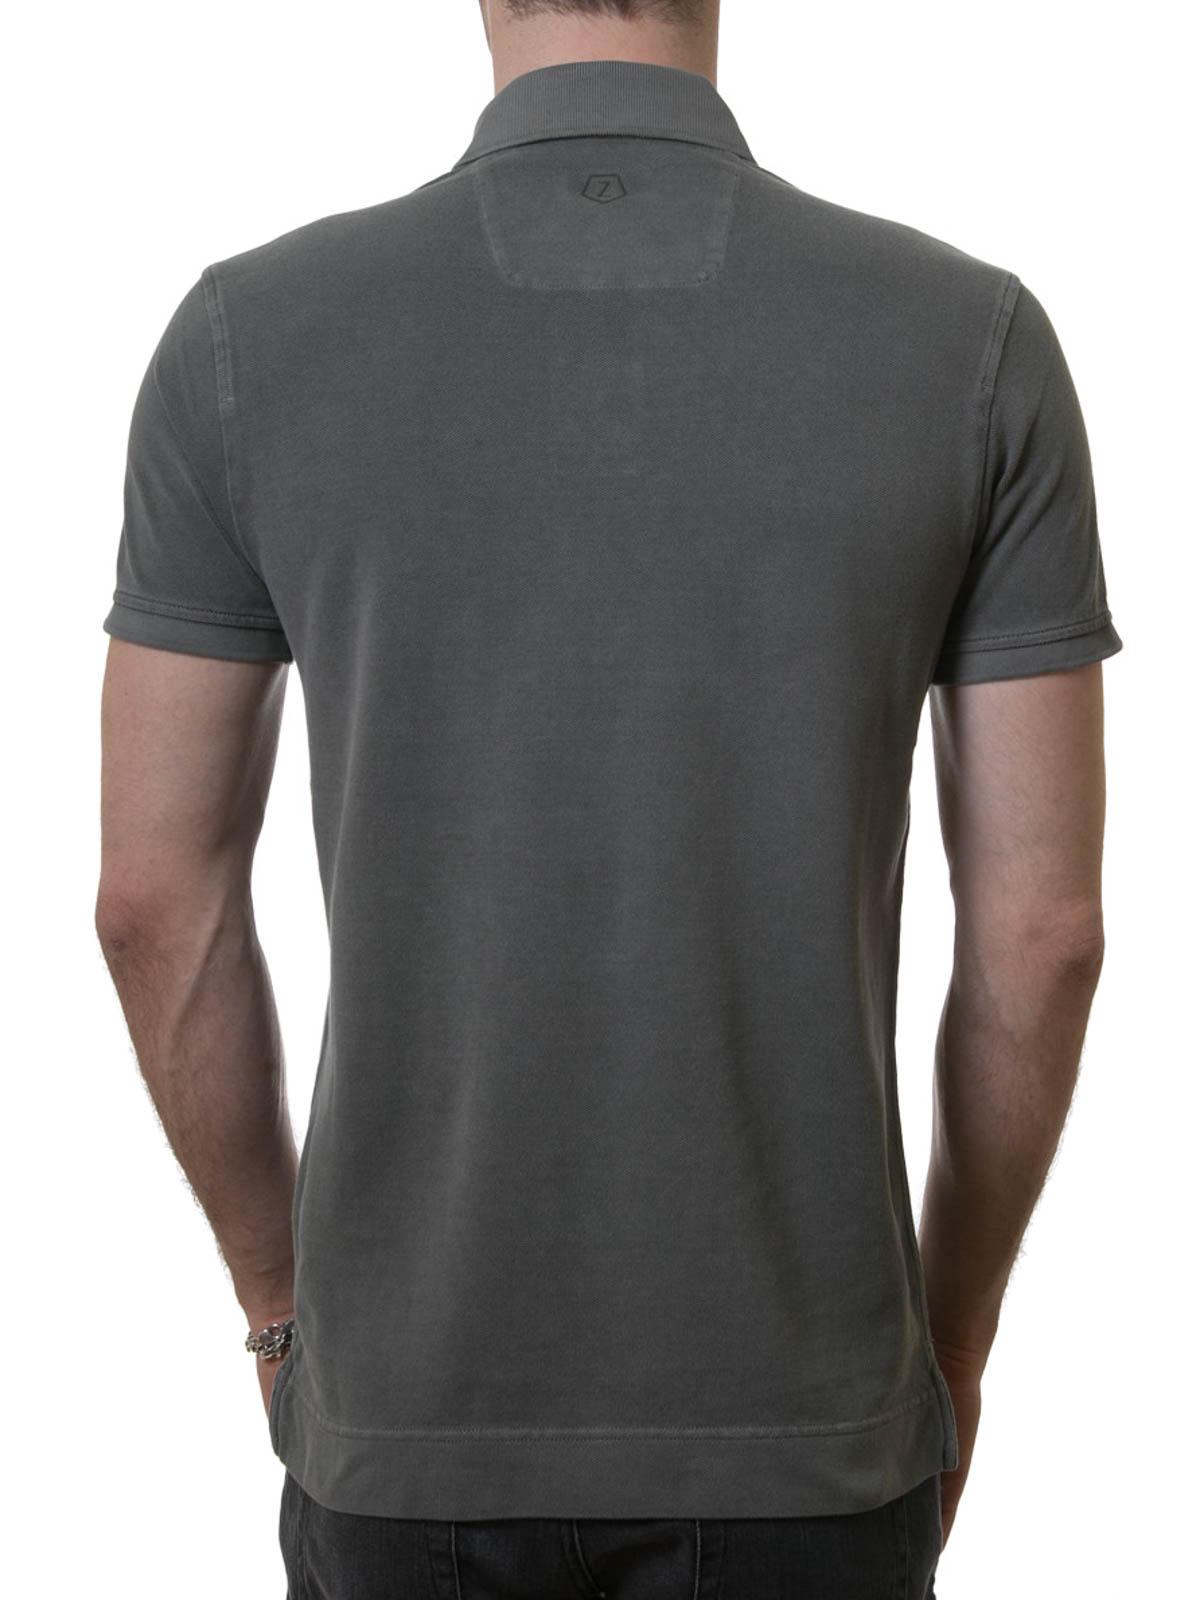 Cotton piquet polo shirt by z zegna polo shirts shop for Zegna polo shirts sale